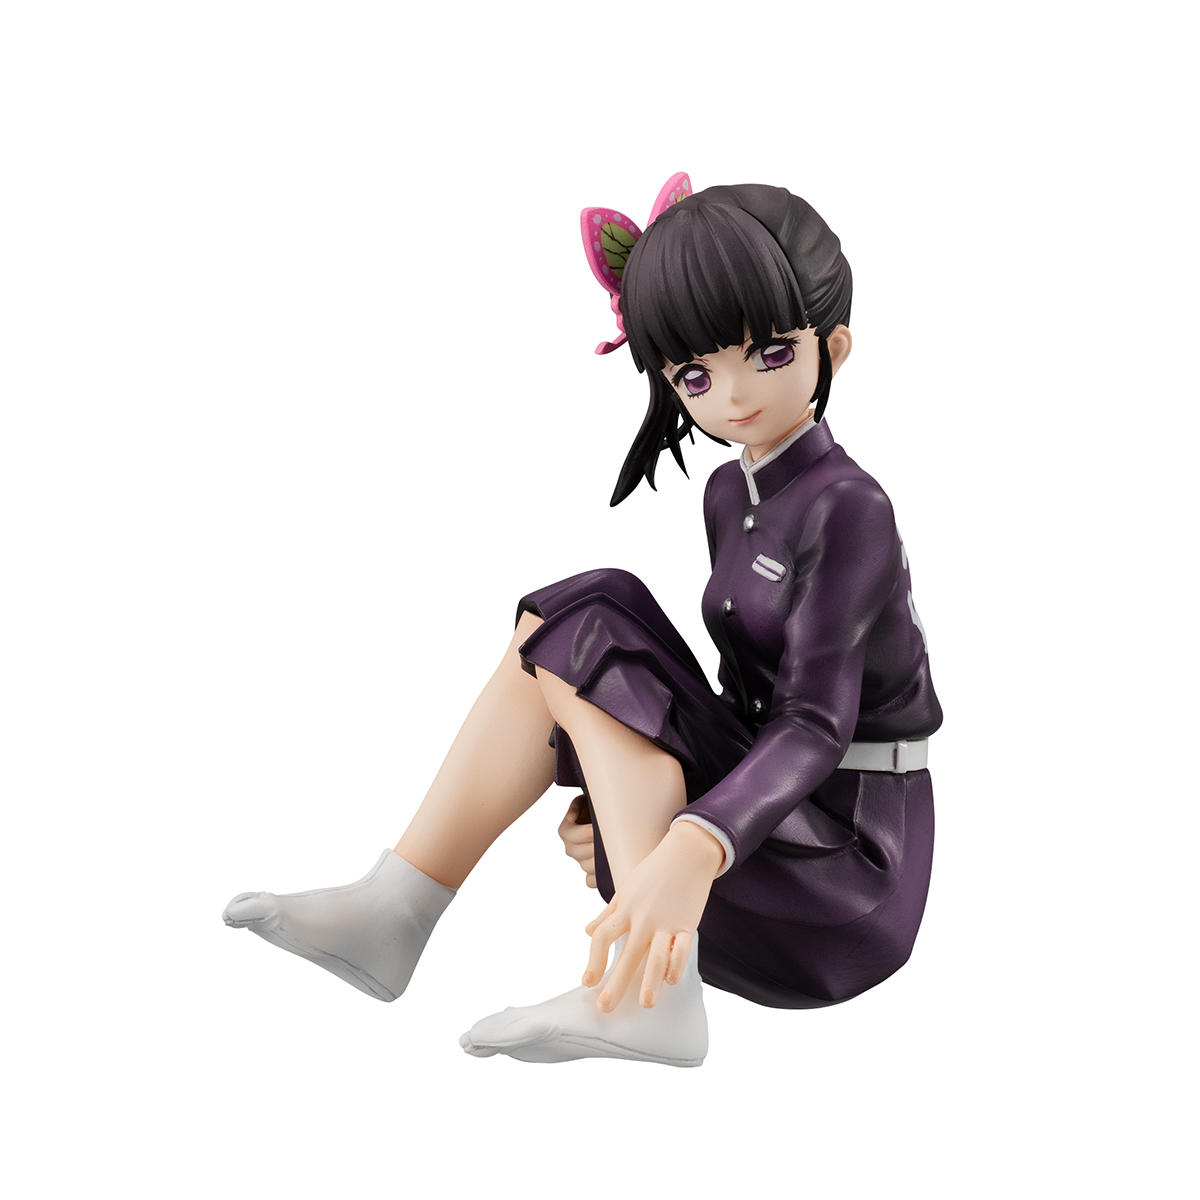 Kanao Demon Slayer GEM Series Figure